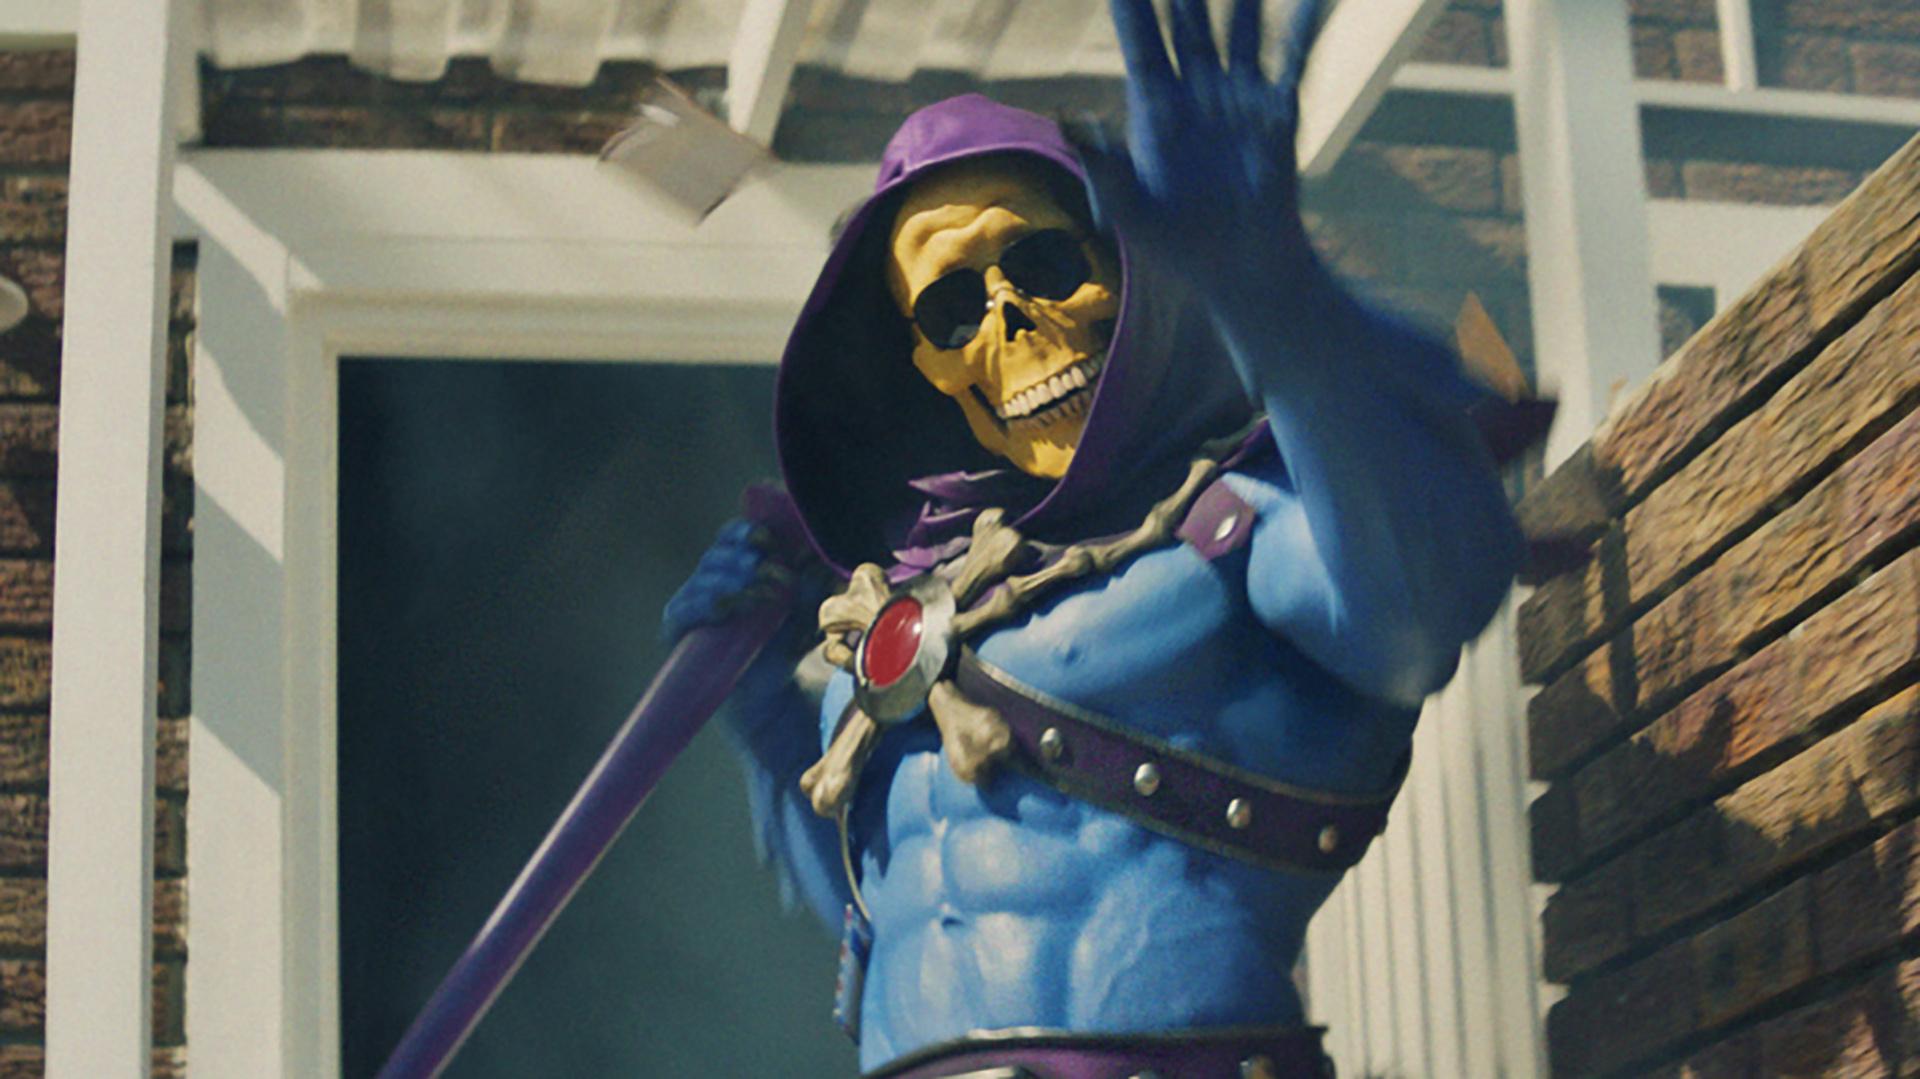 MoneySuperMarket - Epic Skeletor